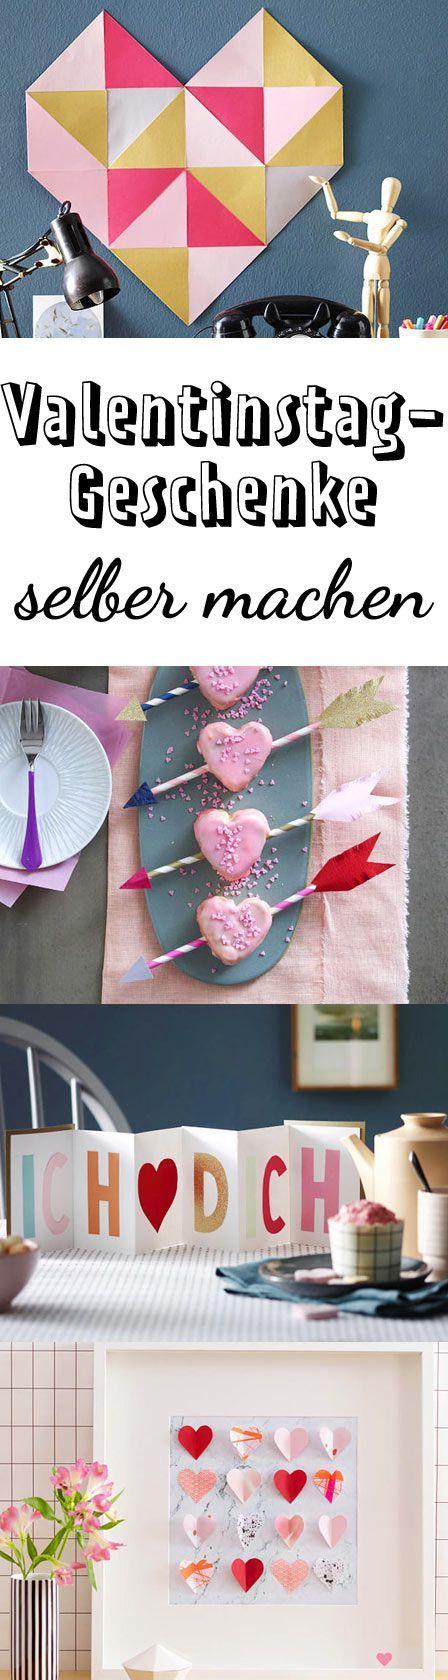 valentinstag geschenke selber machen 5 herzige ideen romantische geschenke pinterest. Black Bedroom Furniture Sets. Home Design Ideas